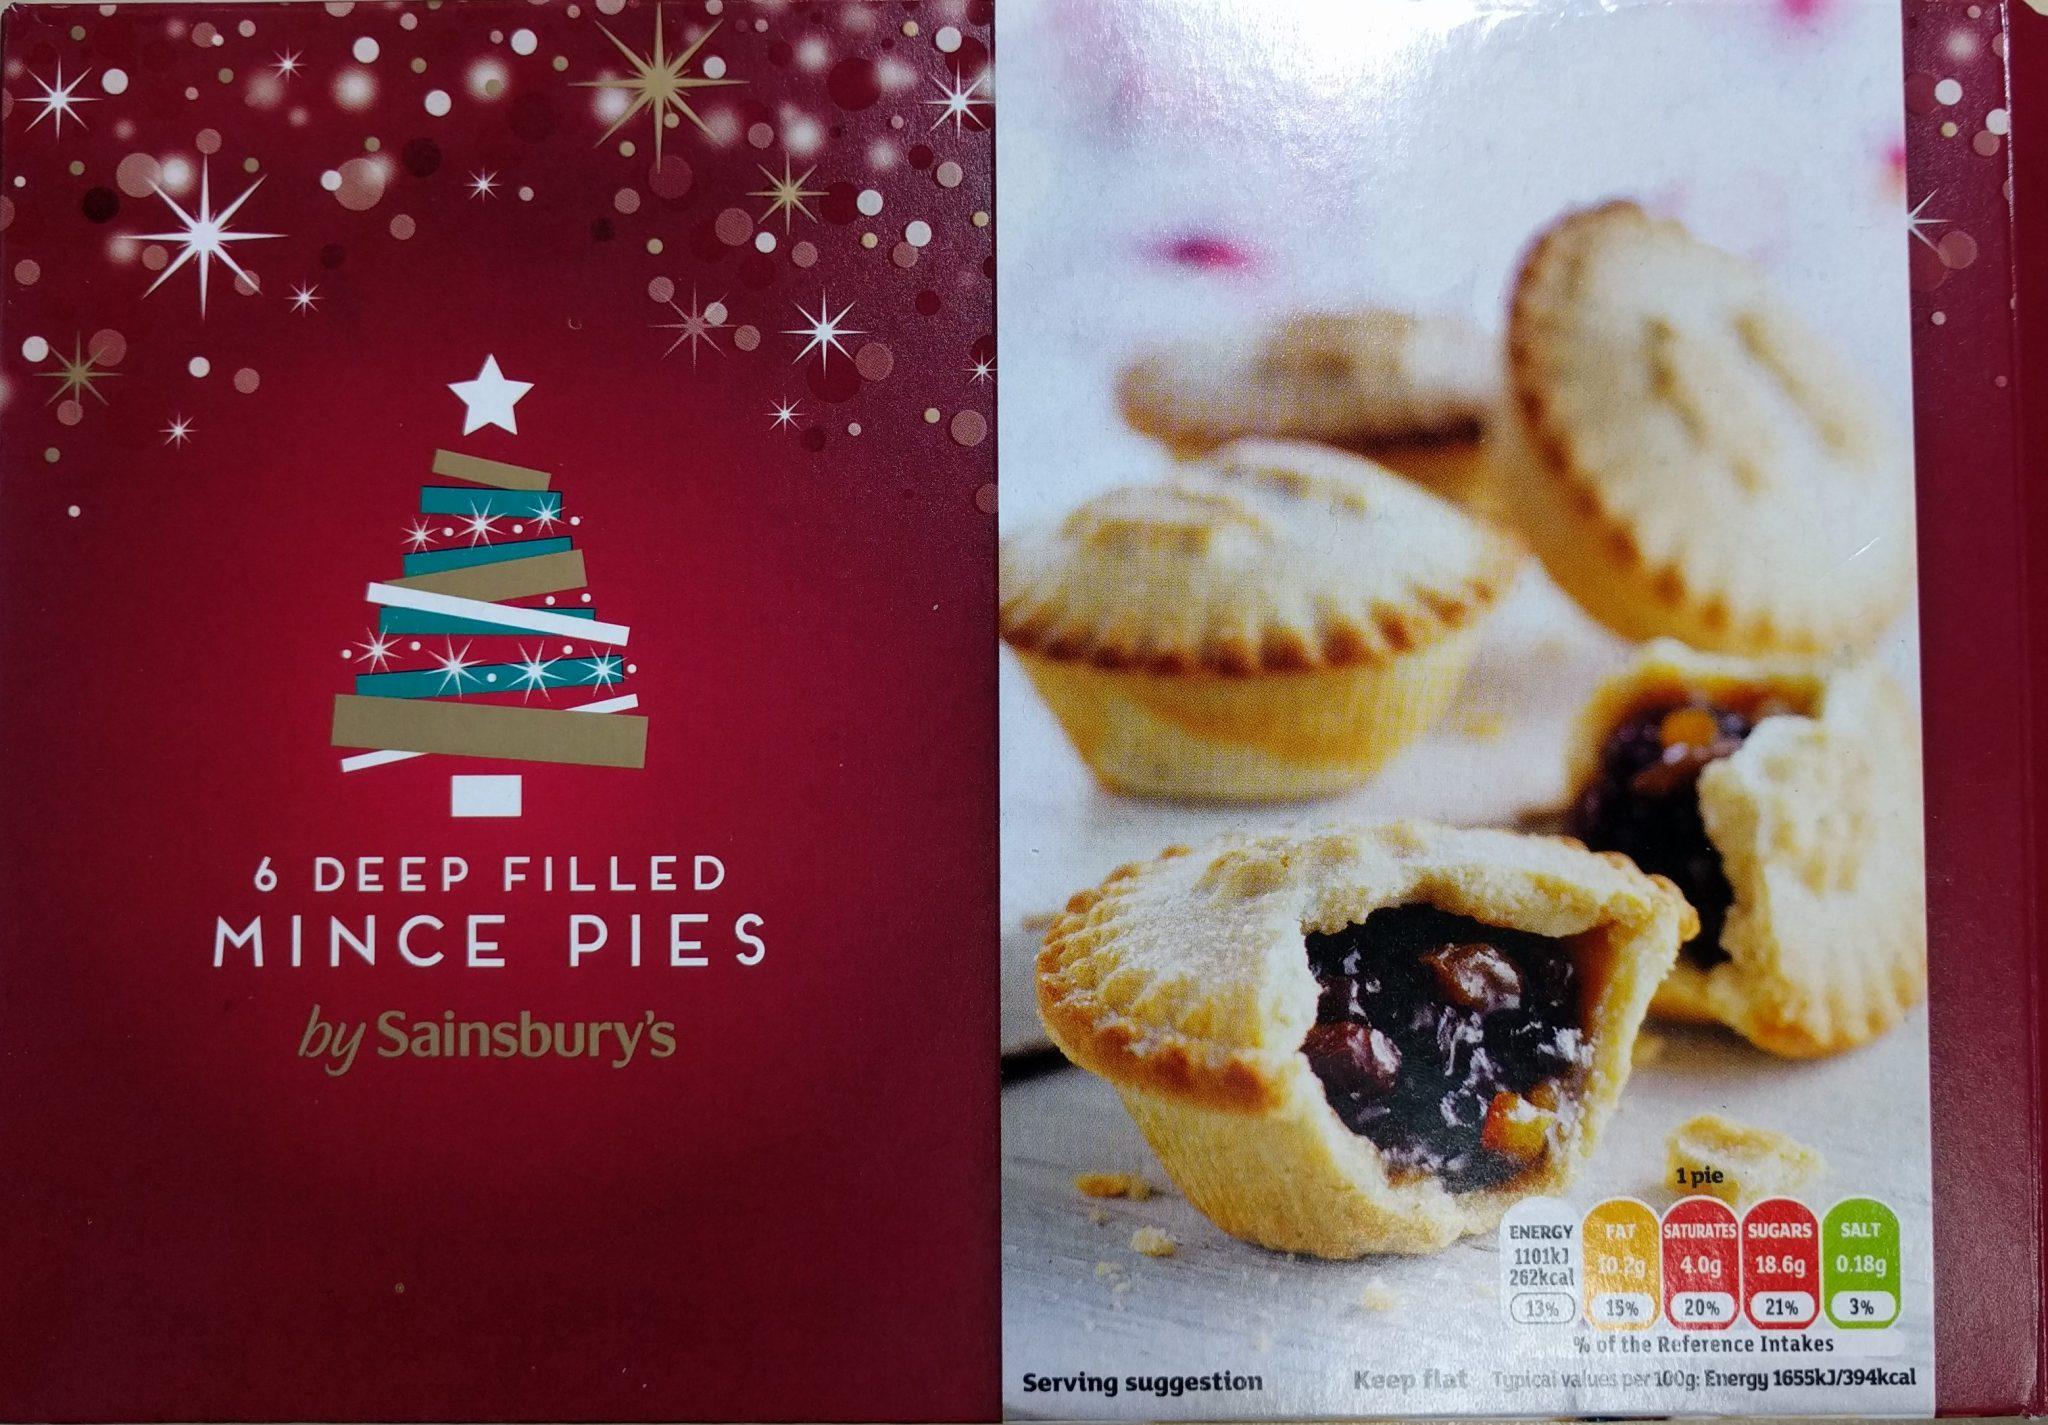 Sainsbury's Deep Filled Mince Pie Box